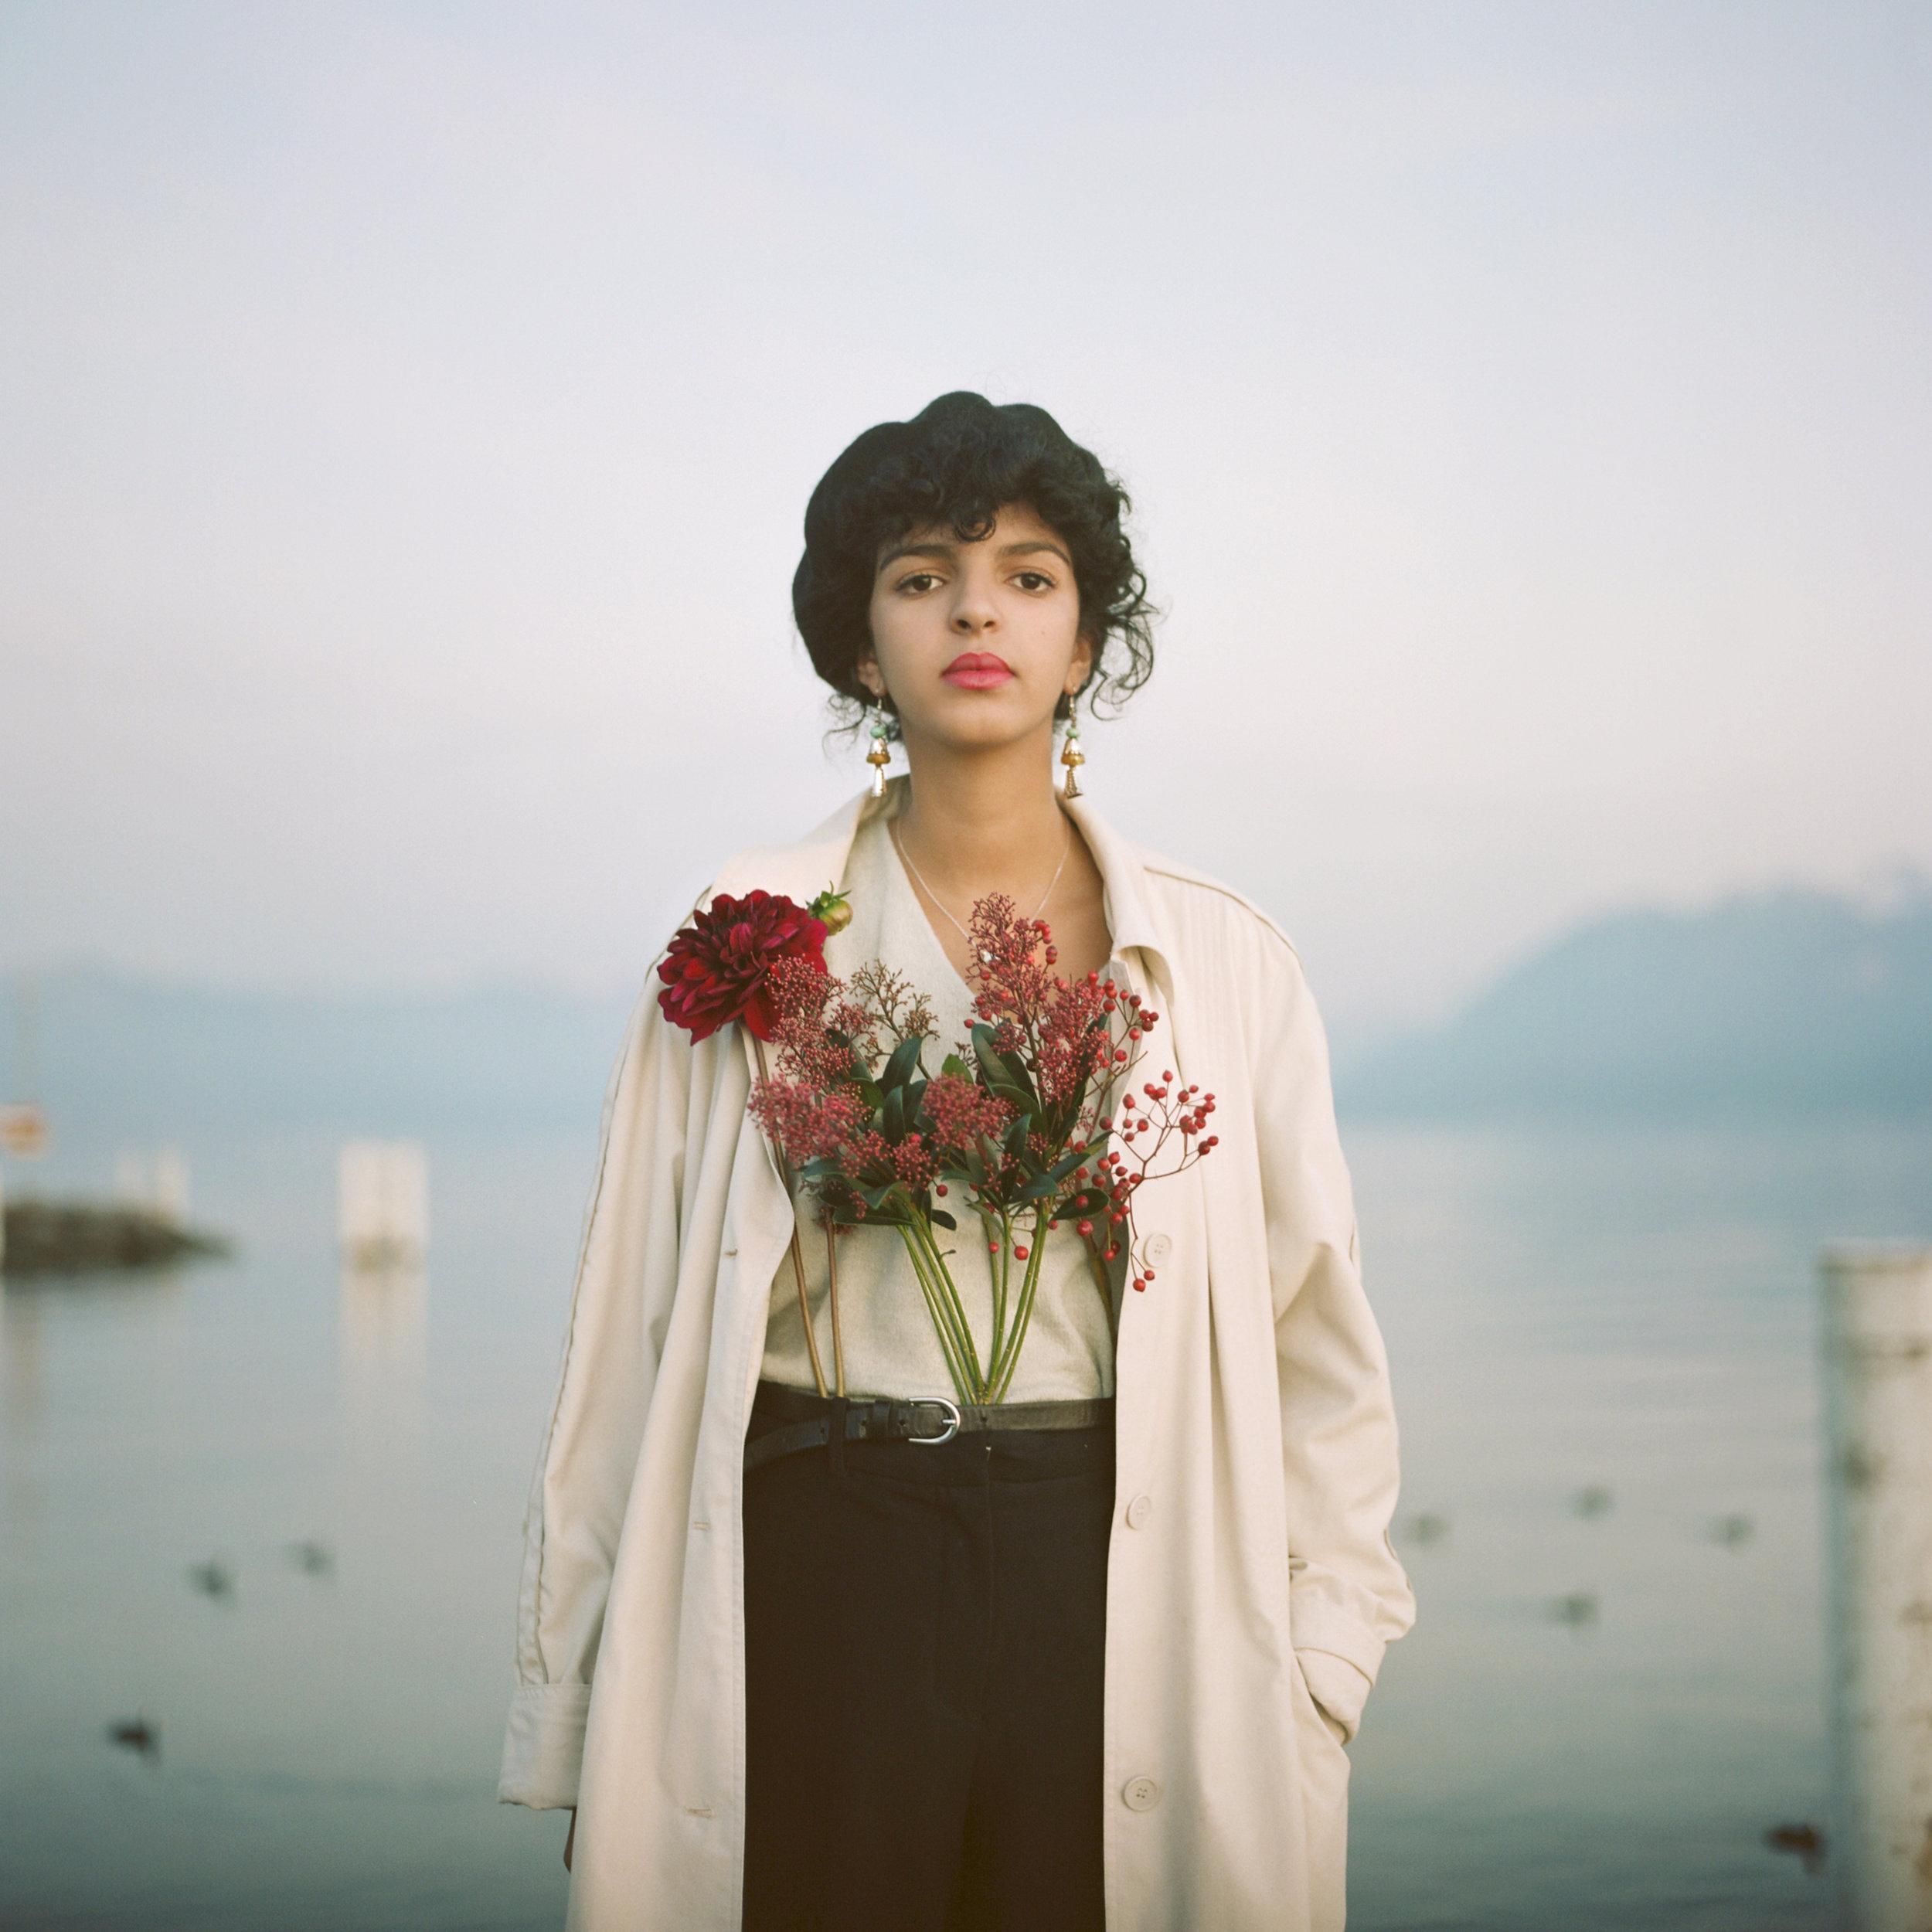 Zineb-Lausanne-Women-Flowers-Christina-Arza.jpg